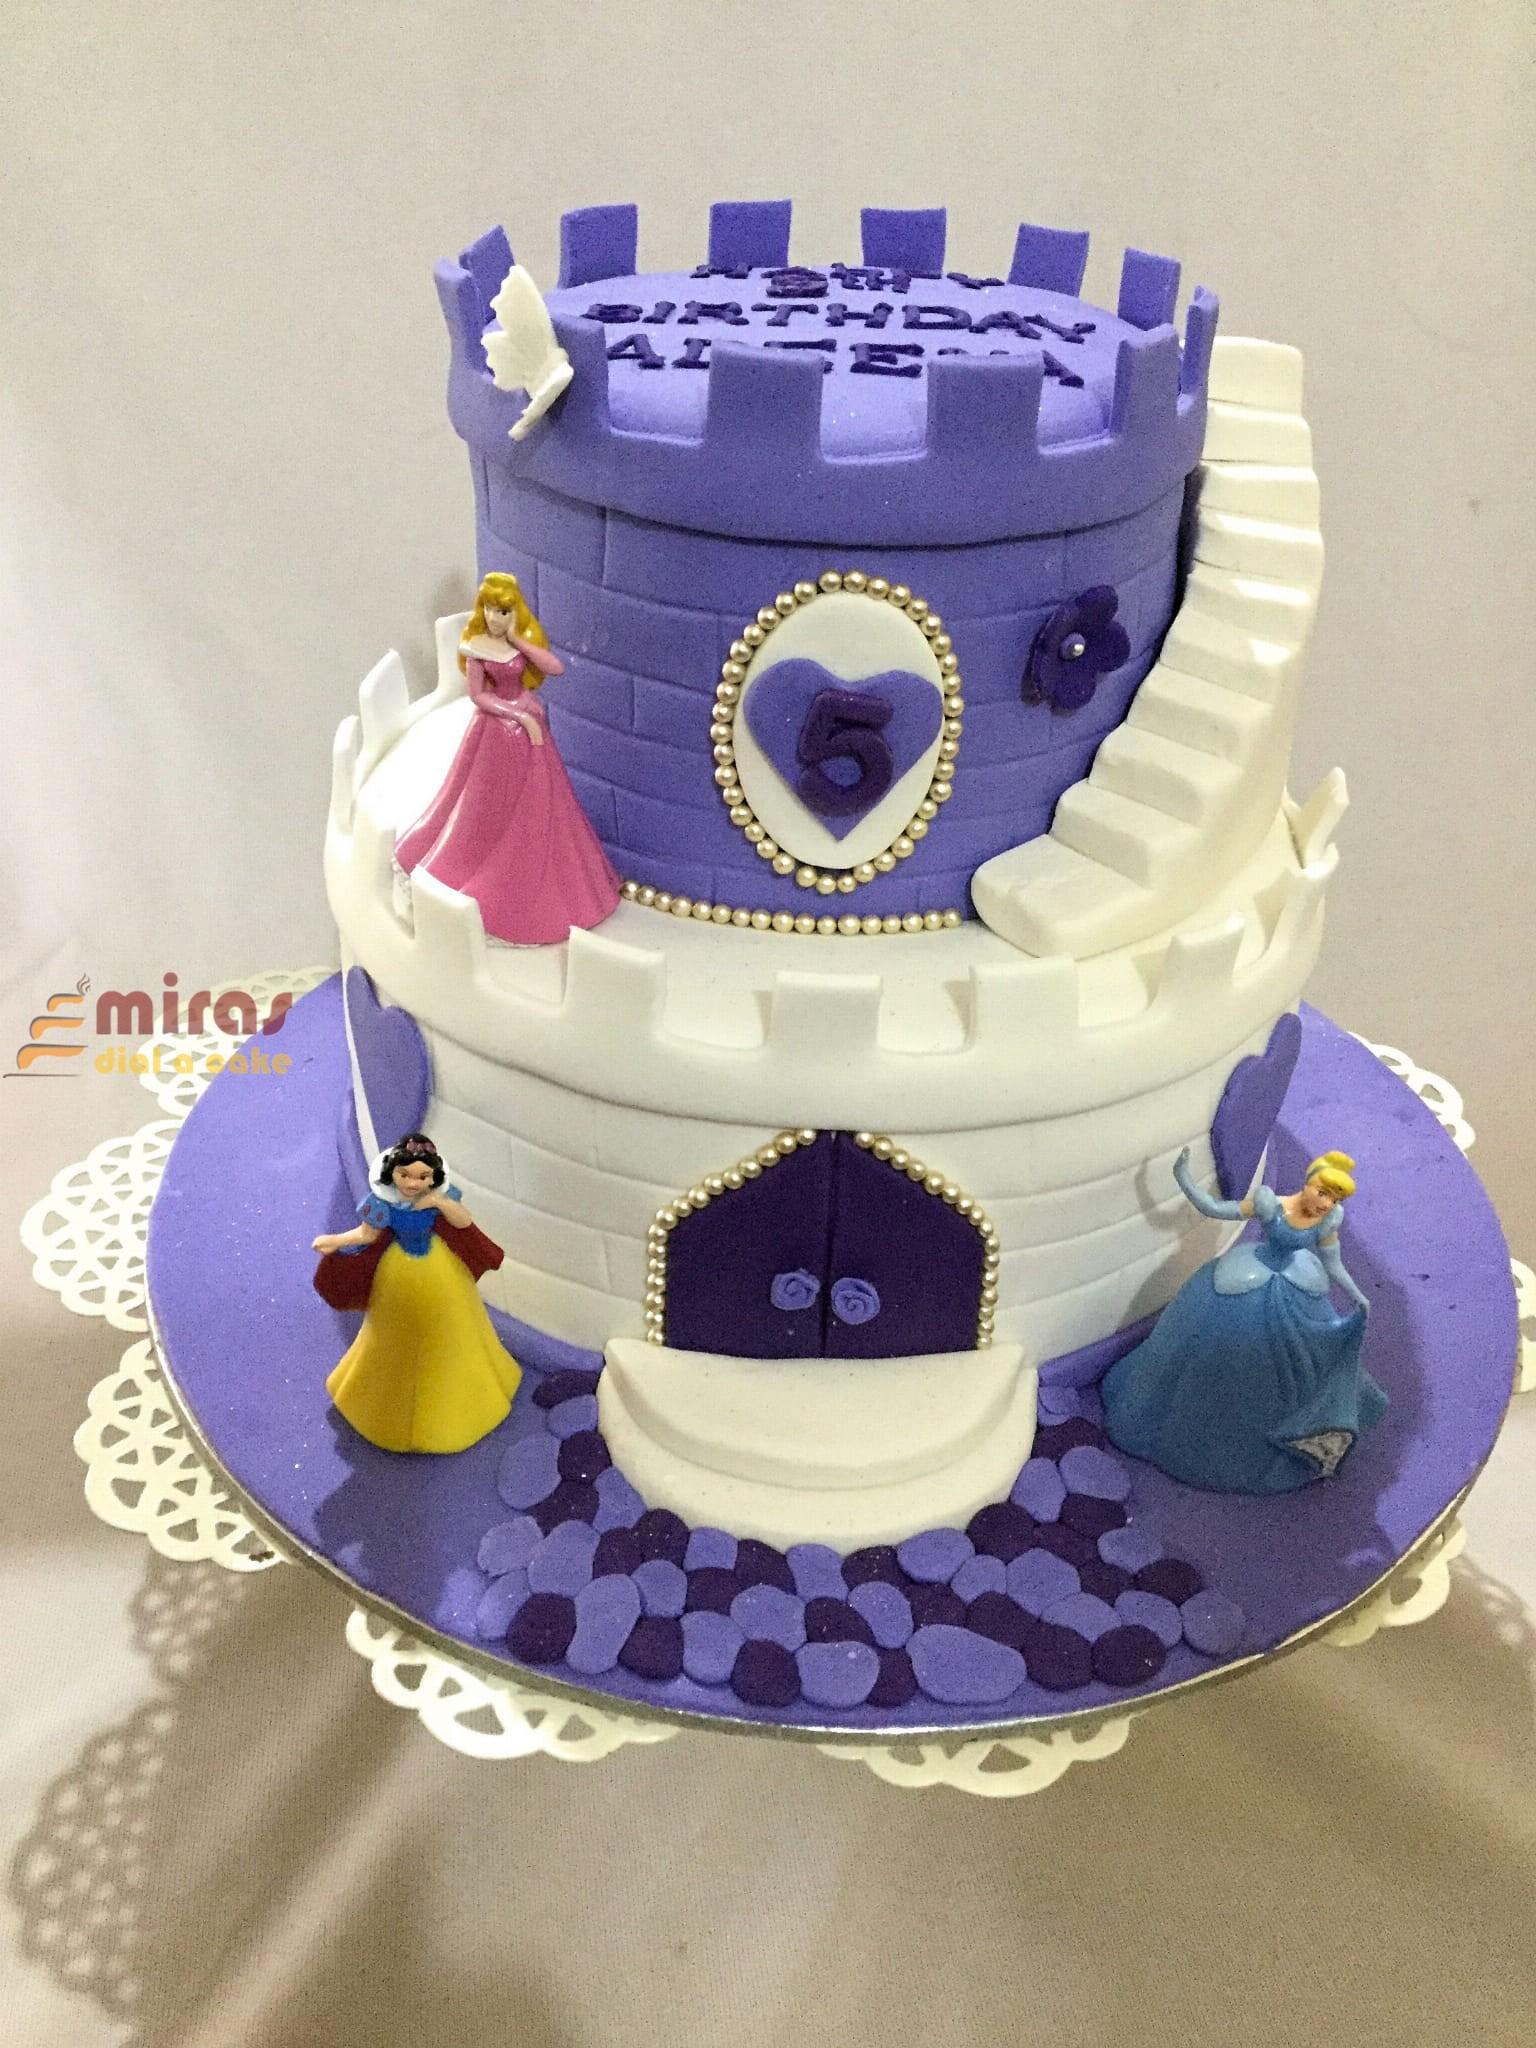 Excellent Online Disney Princess Castle Theme Birthday Cake Customised Personalised Birthday Cards Petedlily Jamesorg